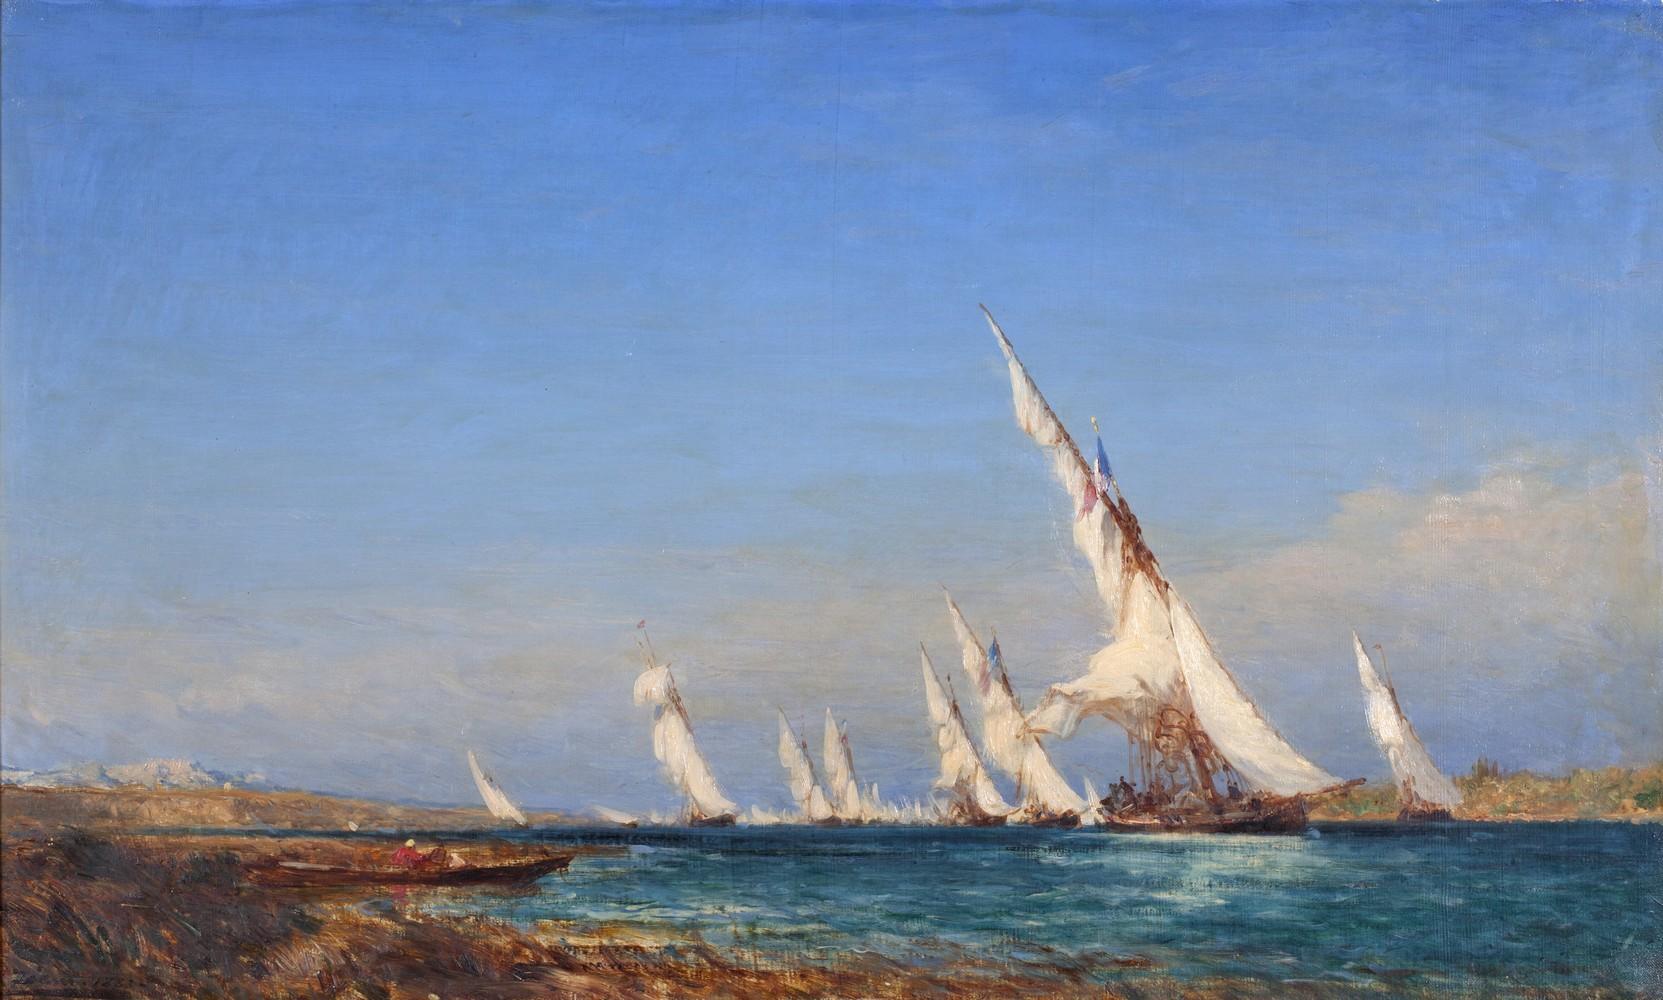 F. Ziem, Lagune dans la Méditerranée - Atelier photo Muzard Beaune